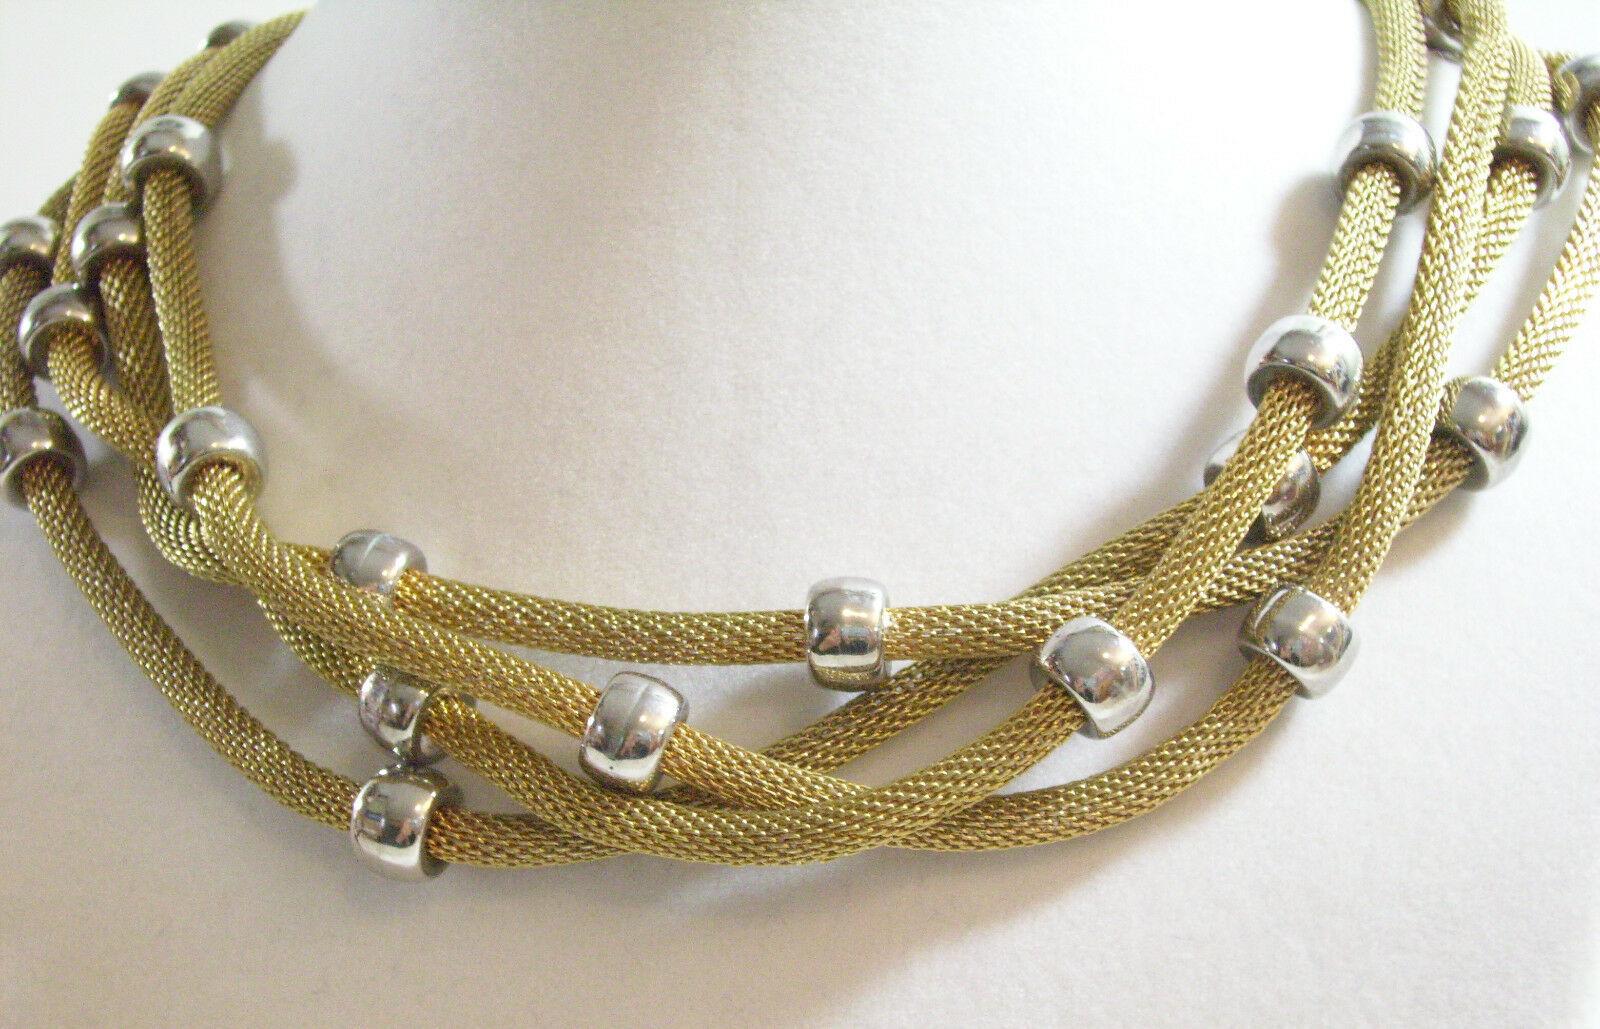 BIJOUX TERNER Gold Tone MESH 3 Strand TWIST Choker Necklace Silver Beads Vintge